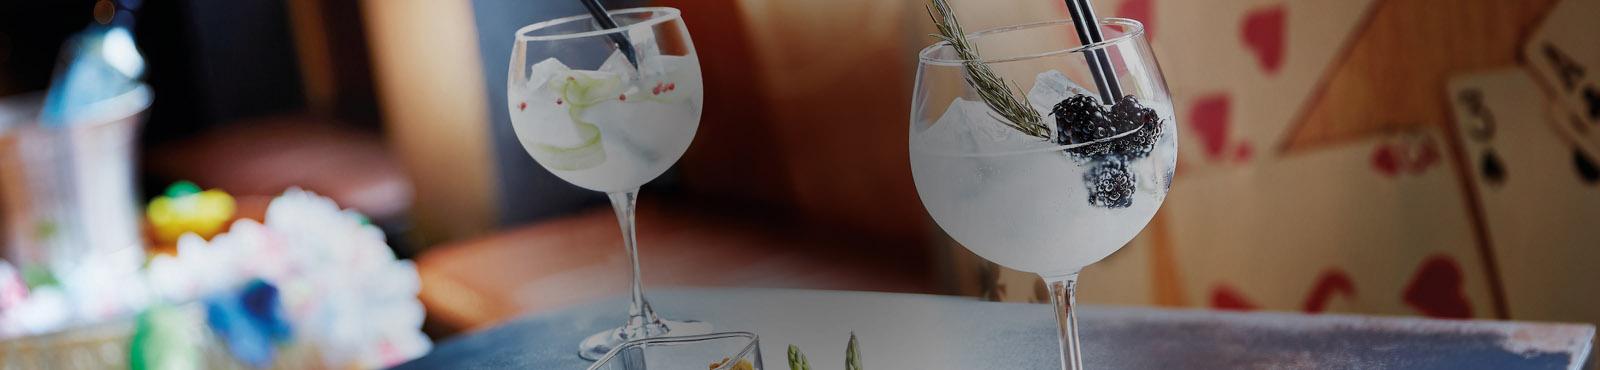 Verre à gin tonic ban